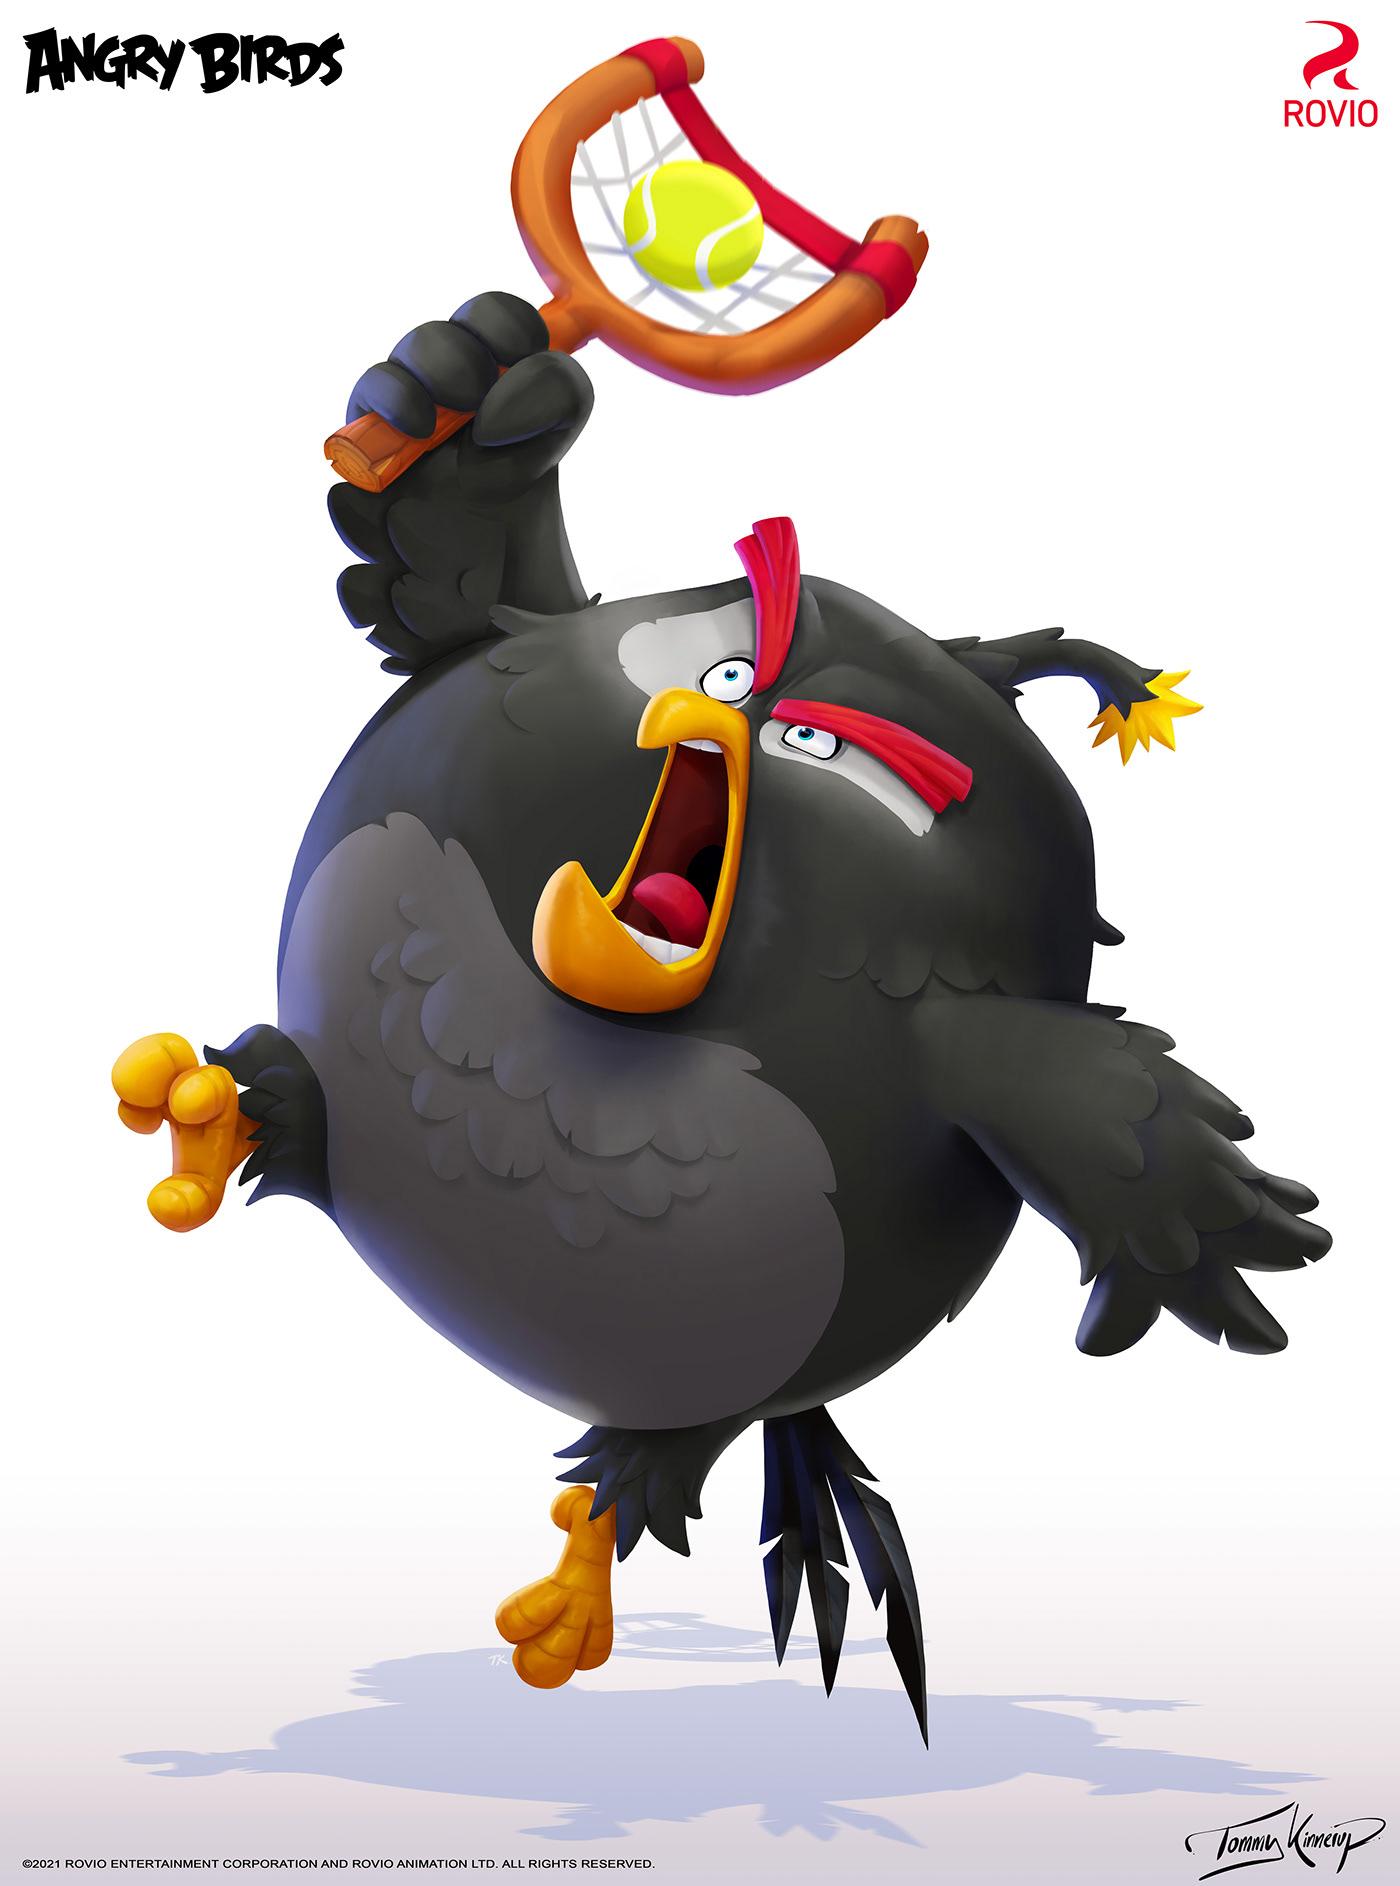 Image may contain: cartoon and bird